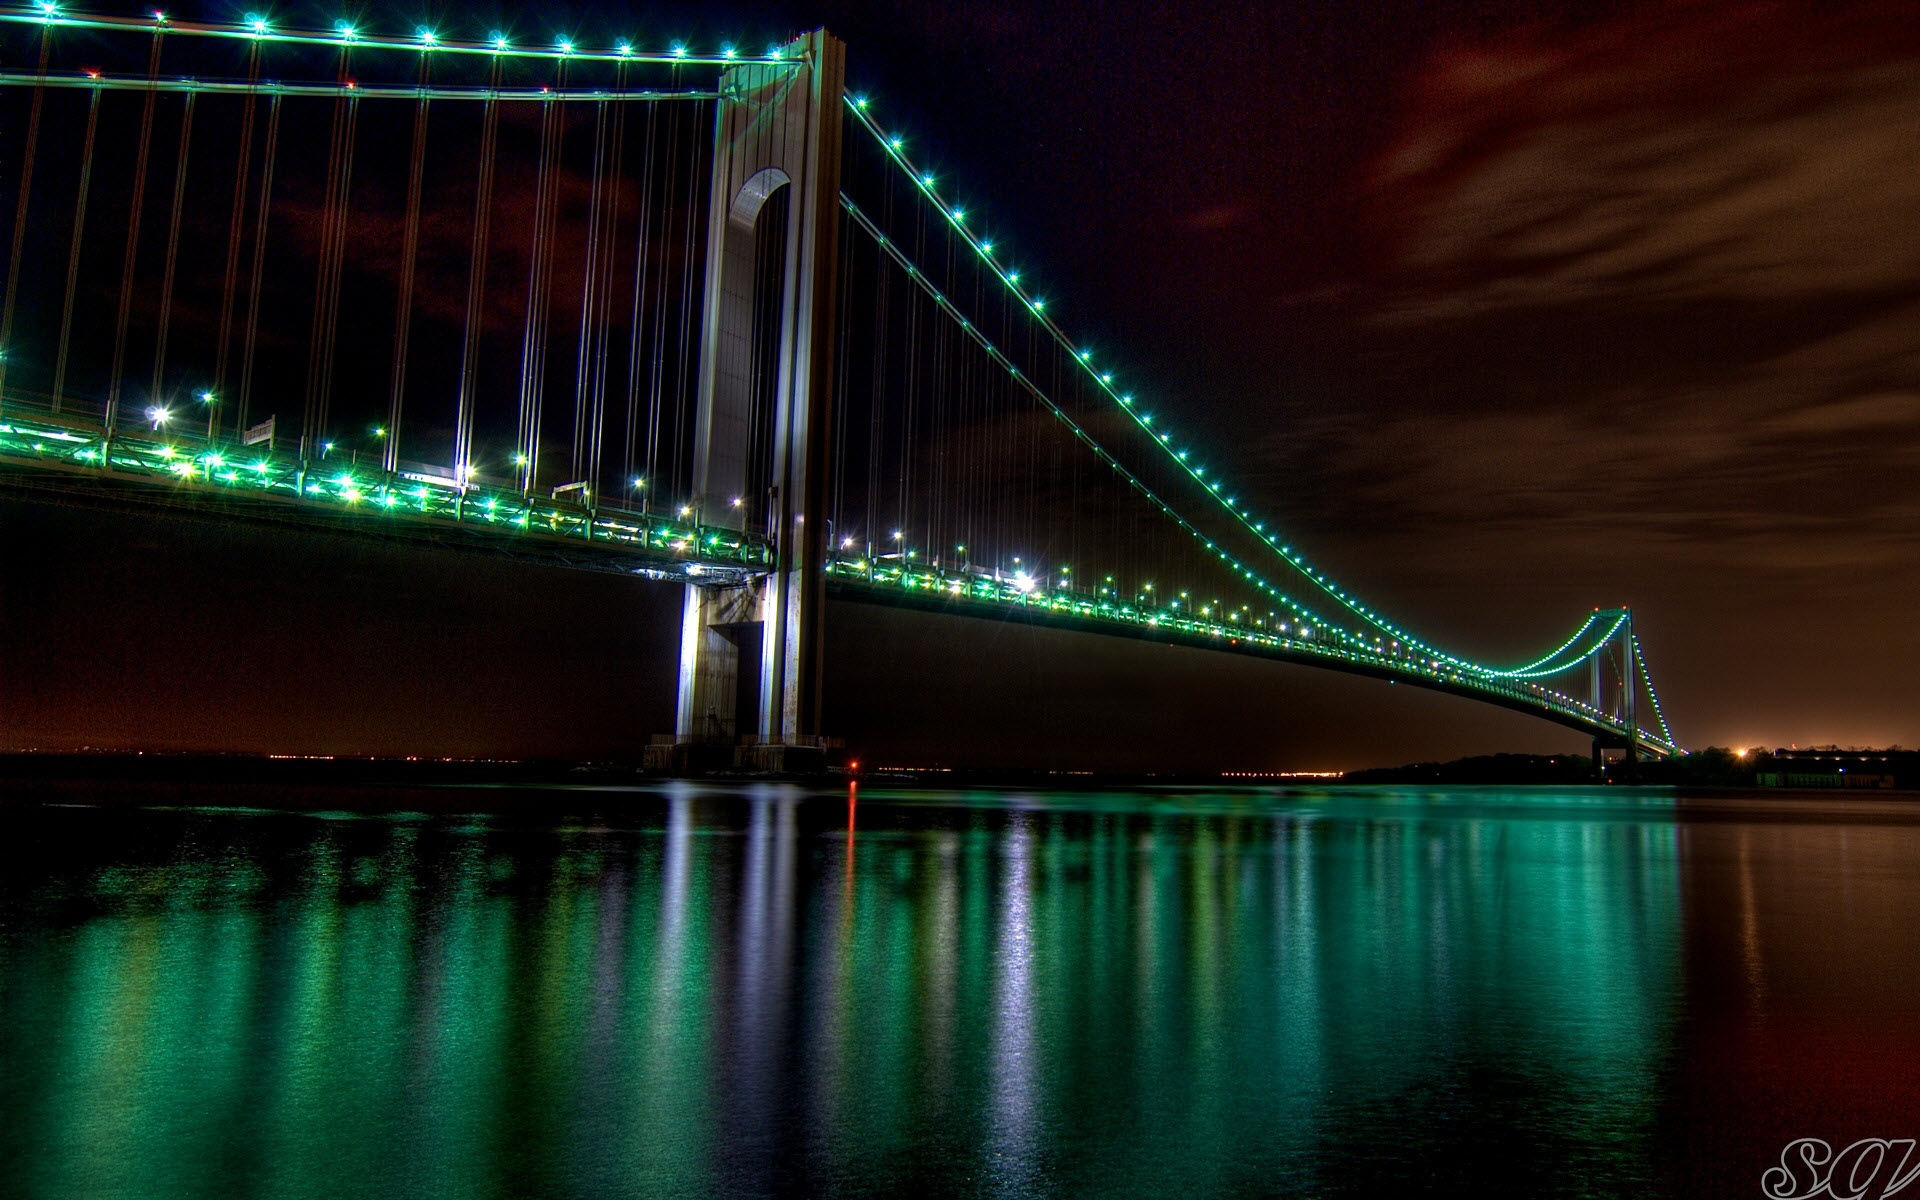 The Golden Gate Bridge Night View wallpaper